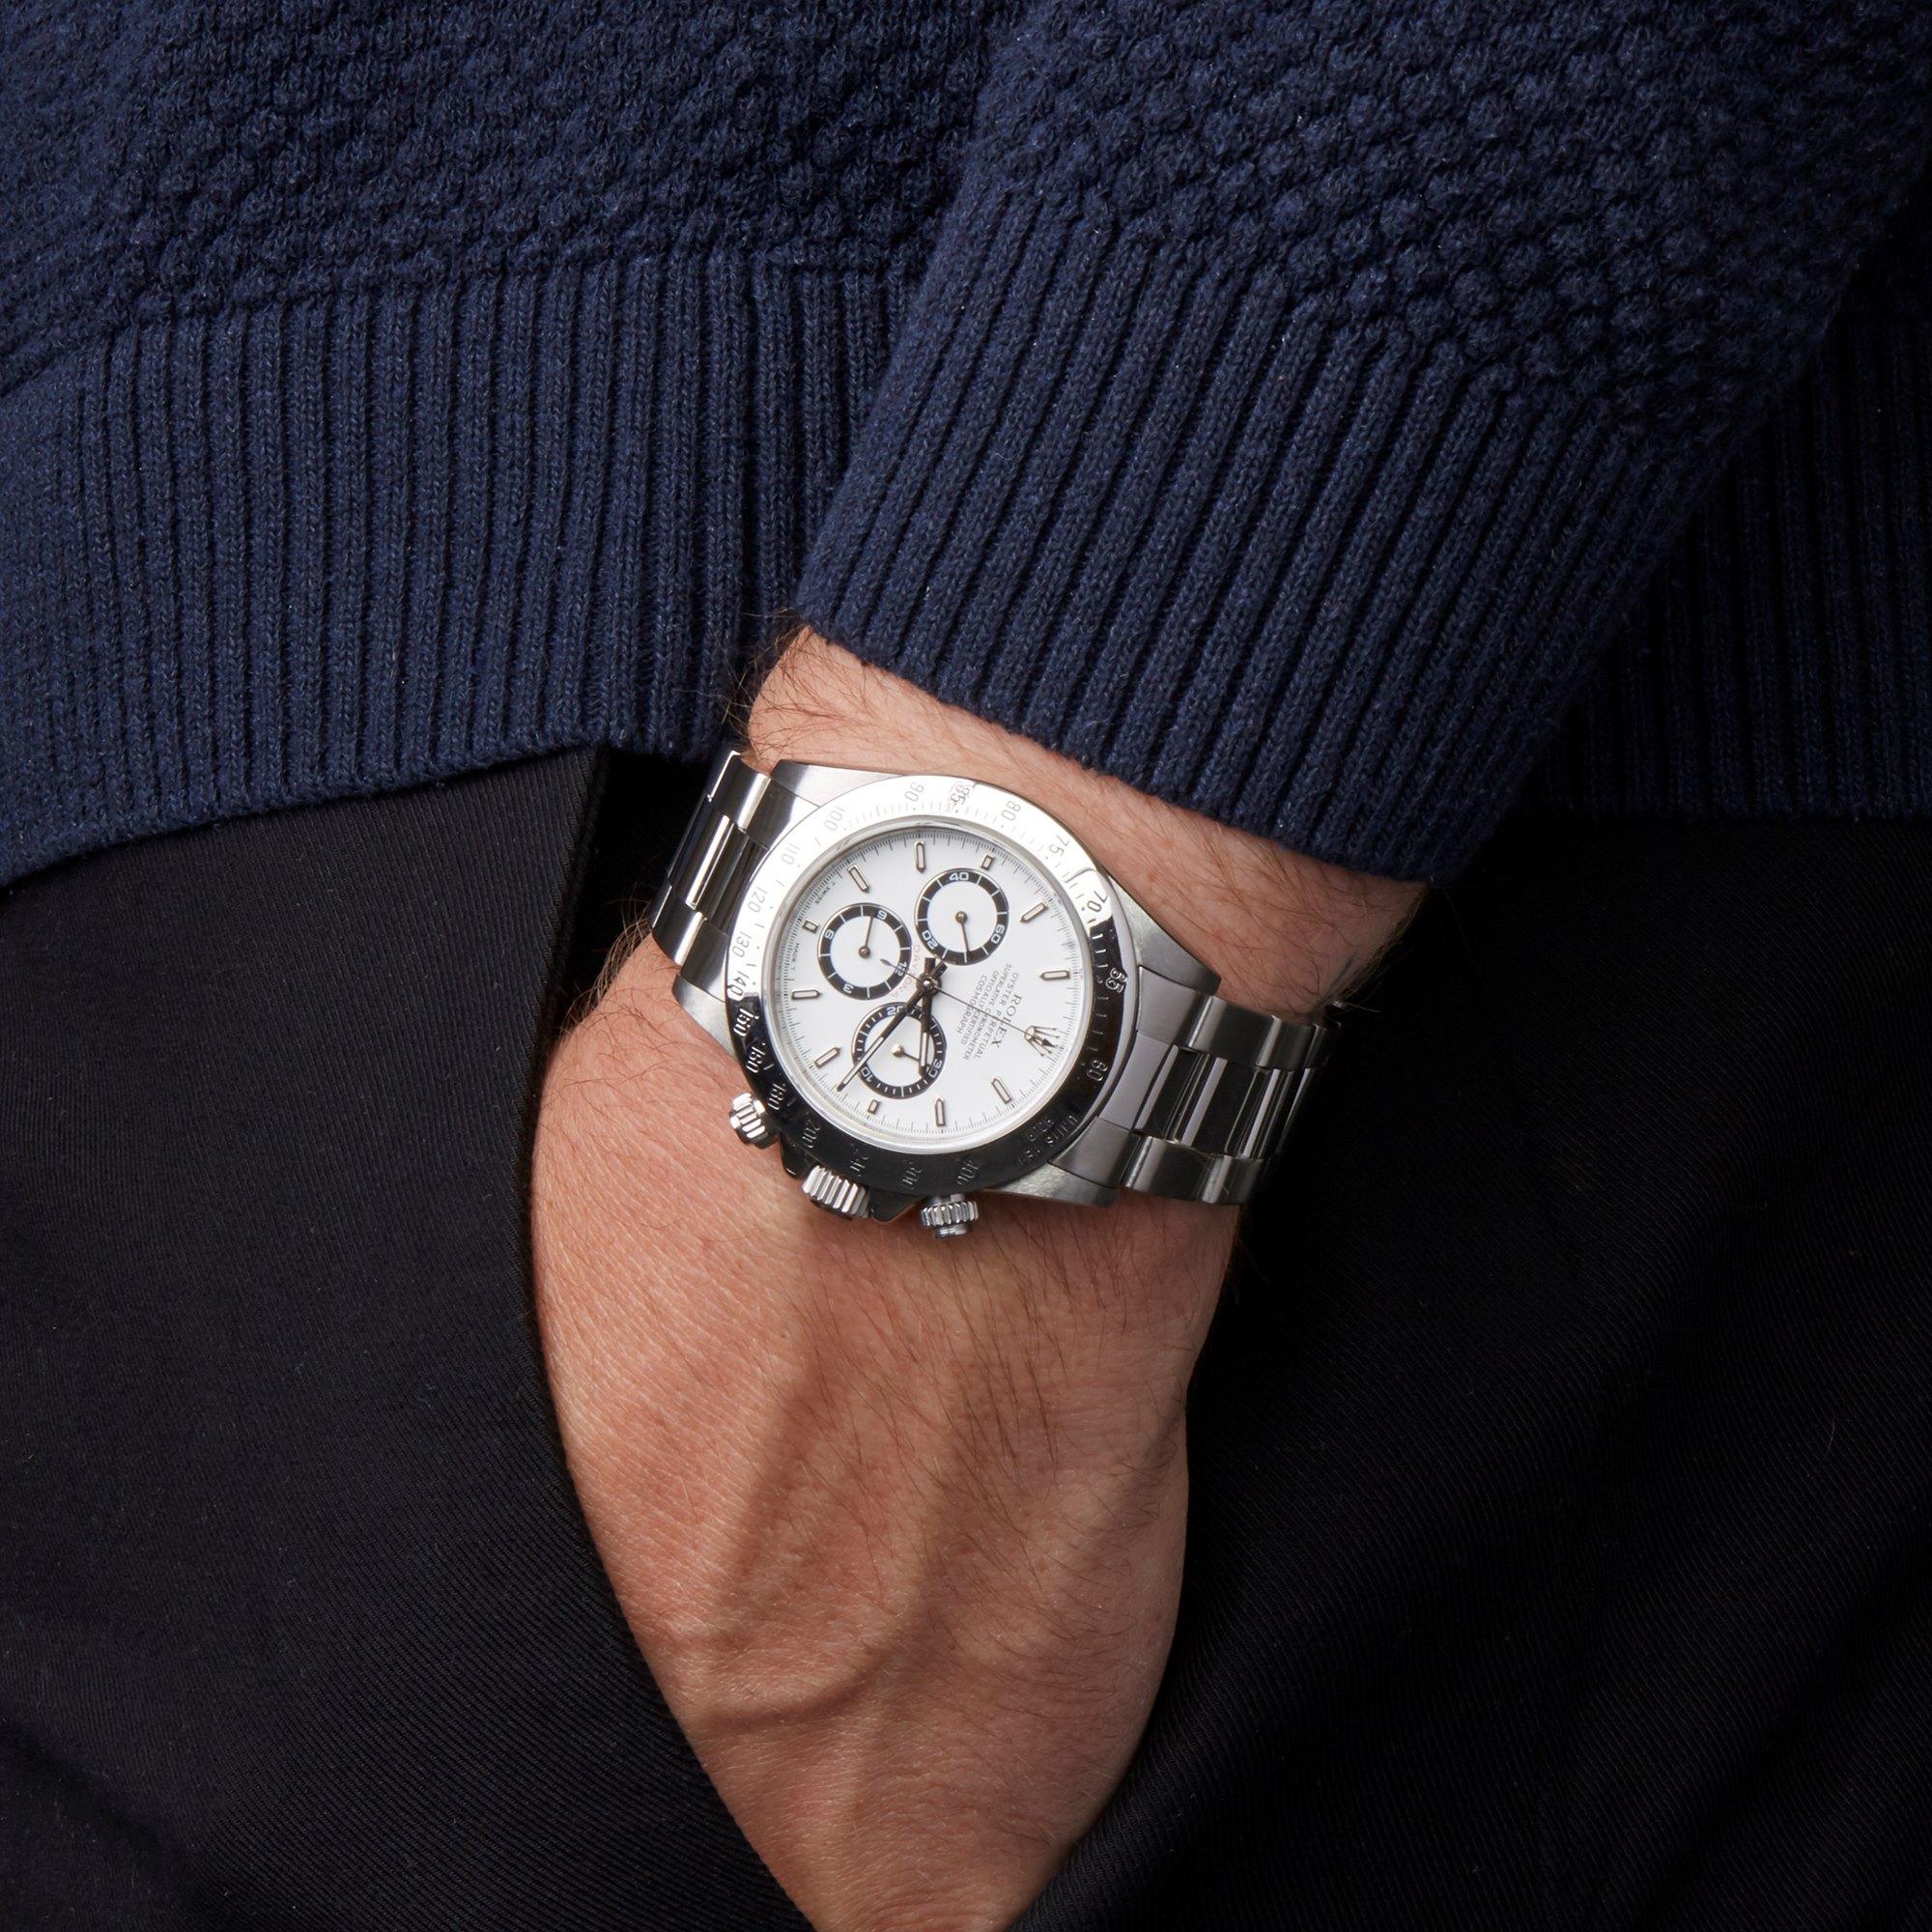 Rolex Daytona Zenith Chronograph Stainless Steel 16520